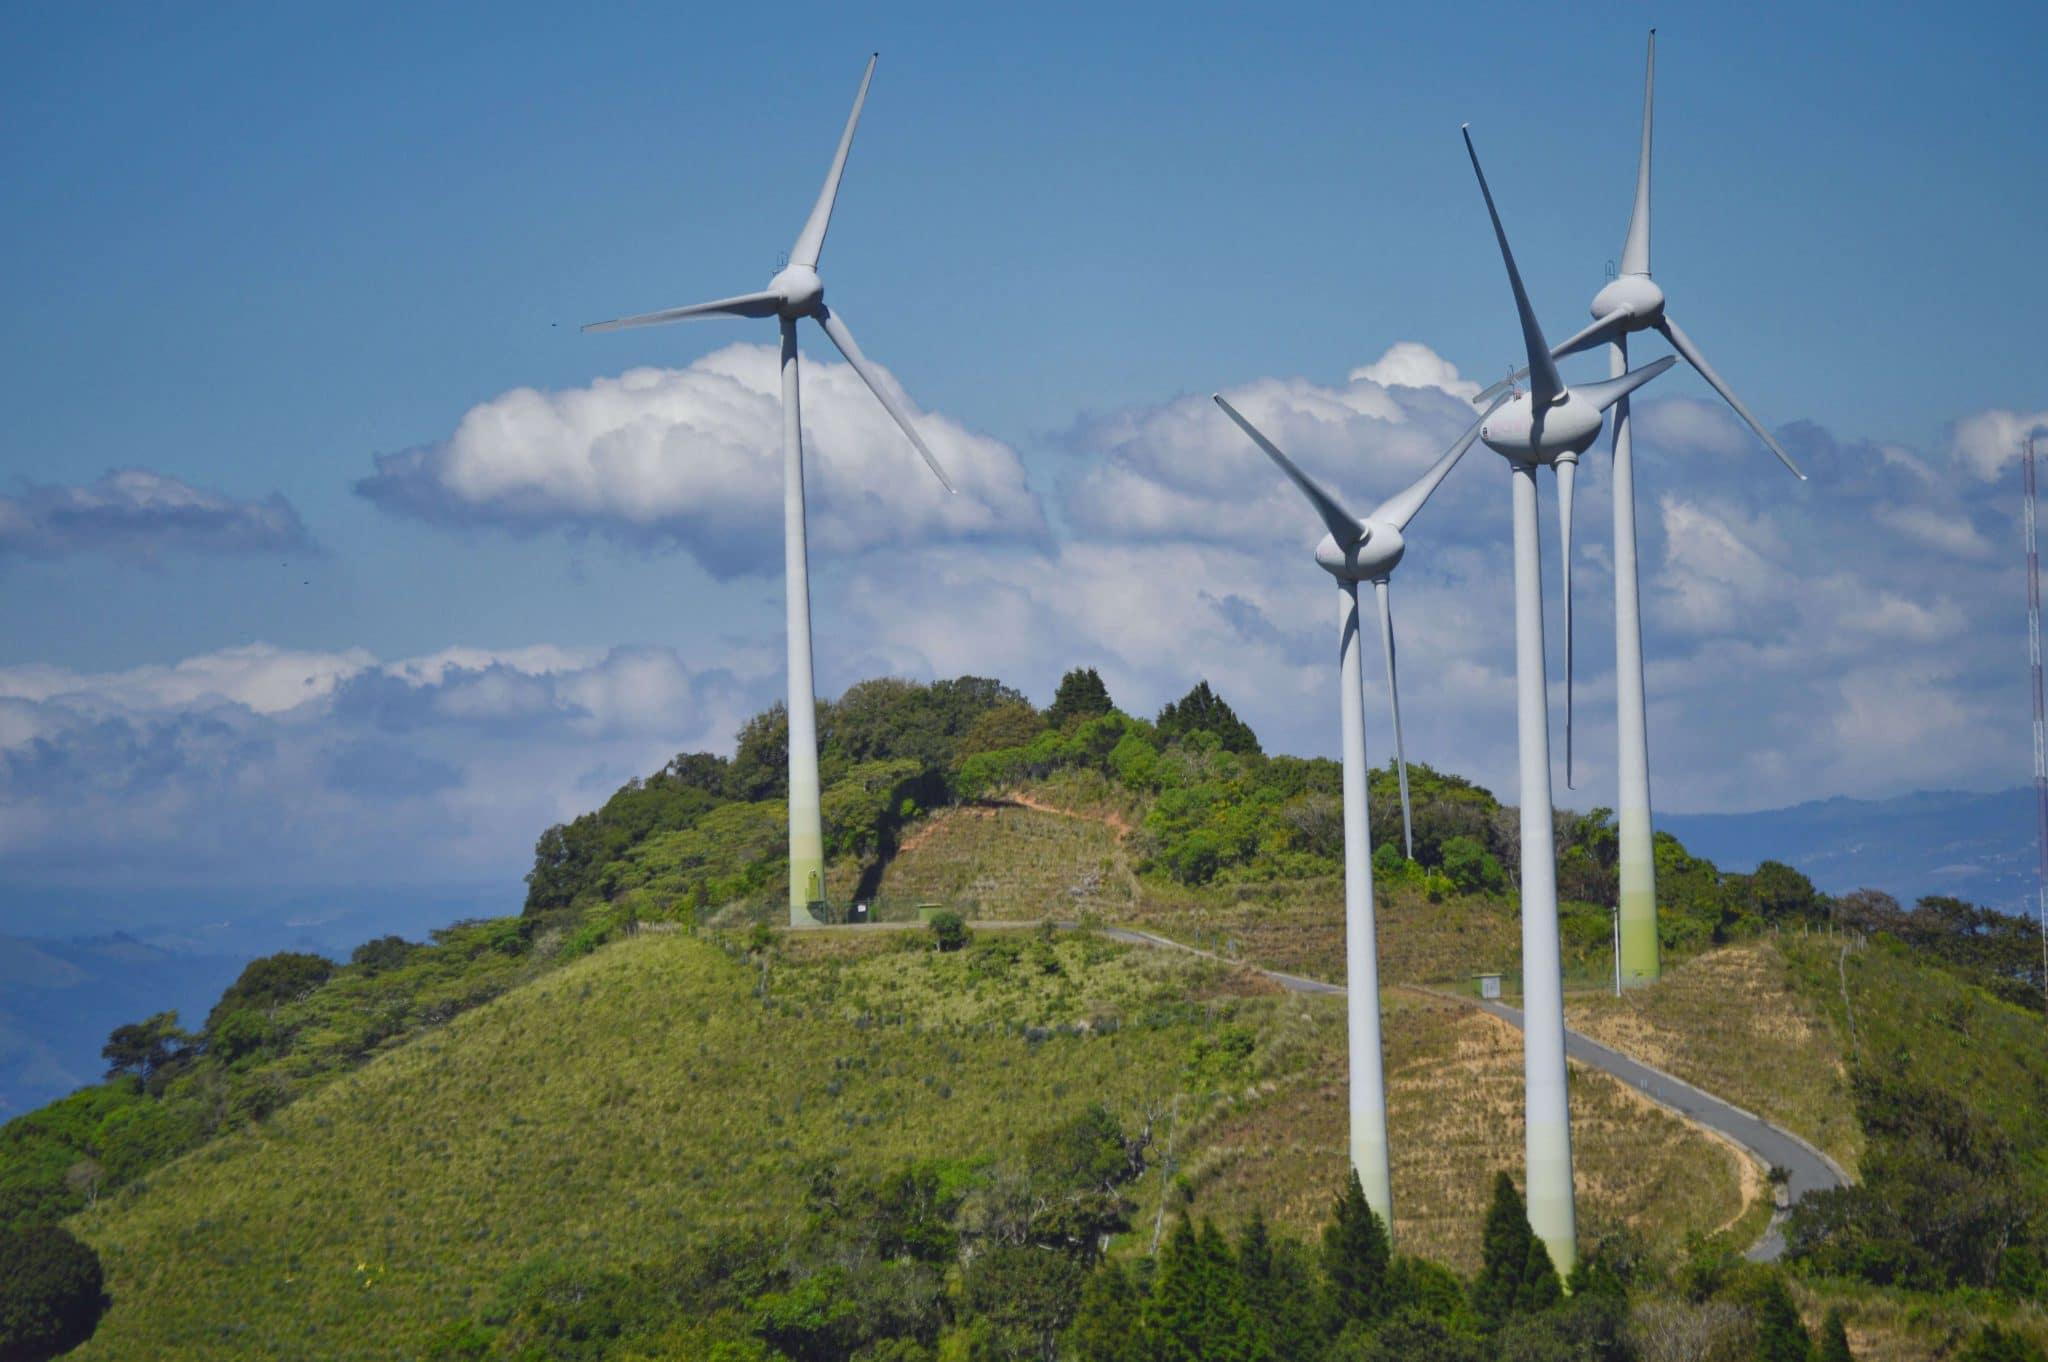 Photo of wind turbines in Costa Rica